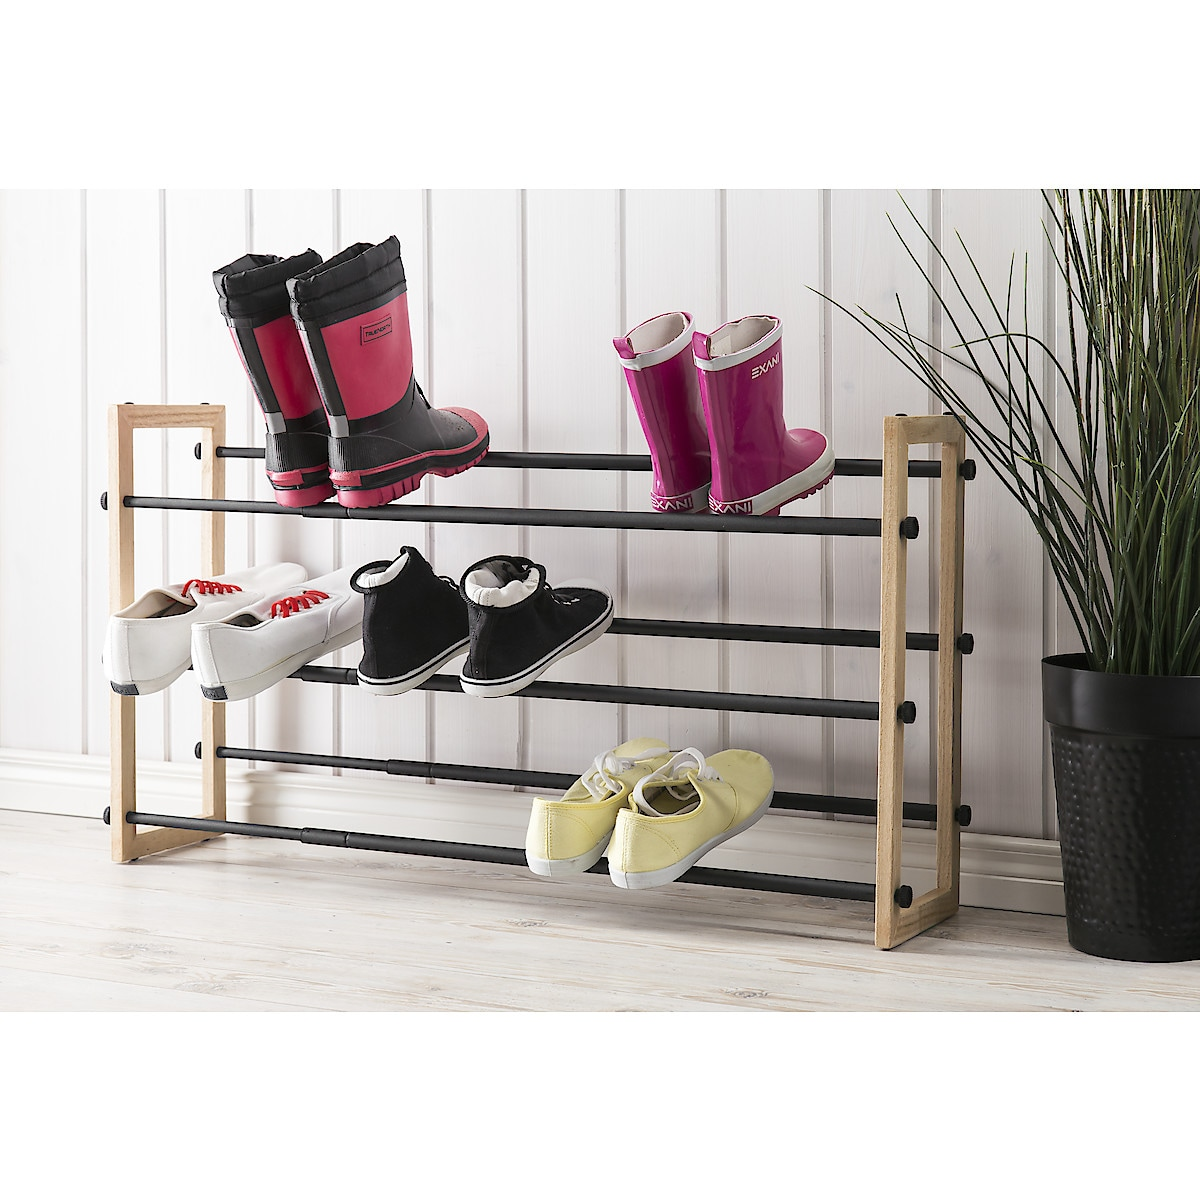 Extendable Metal/Wood Shoe Rack